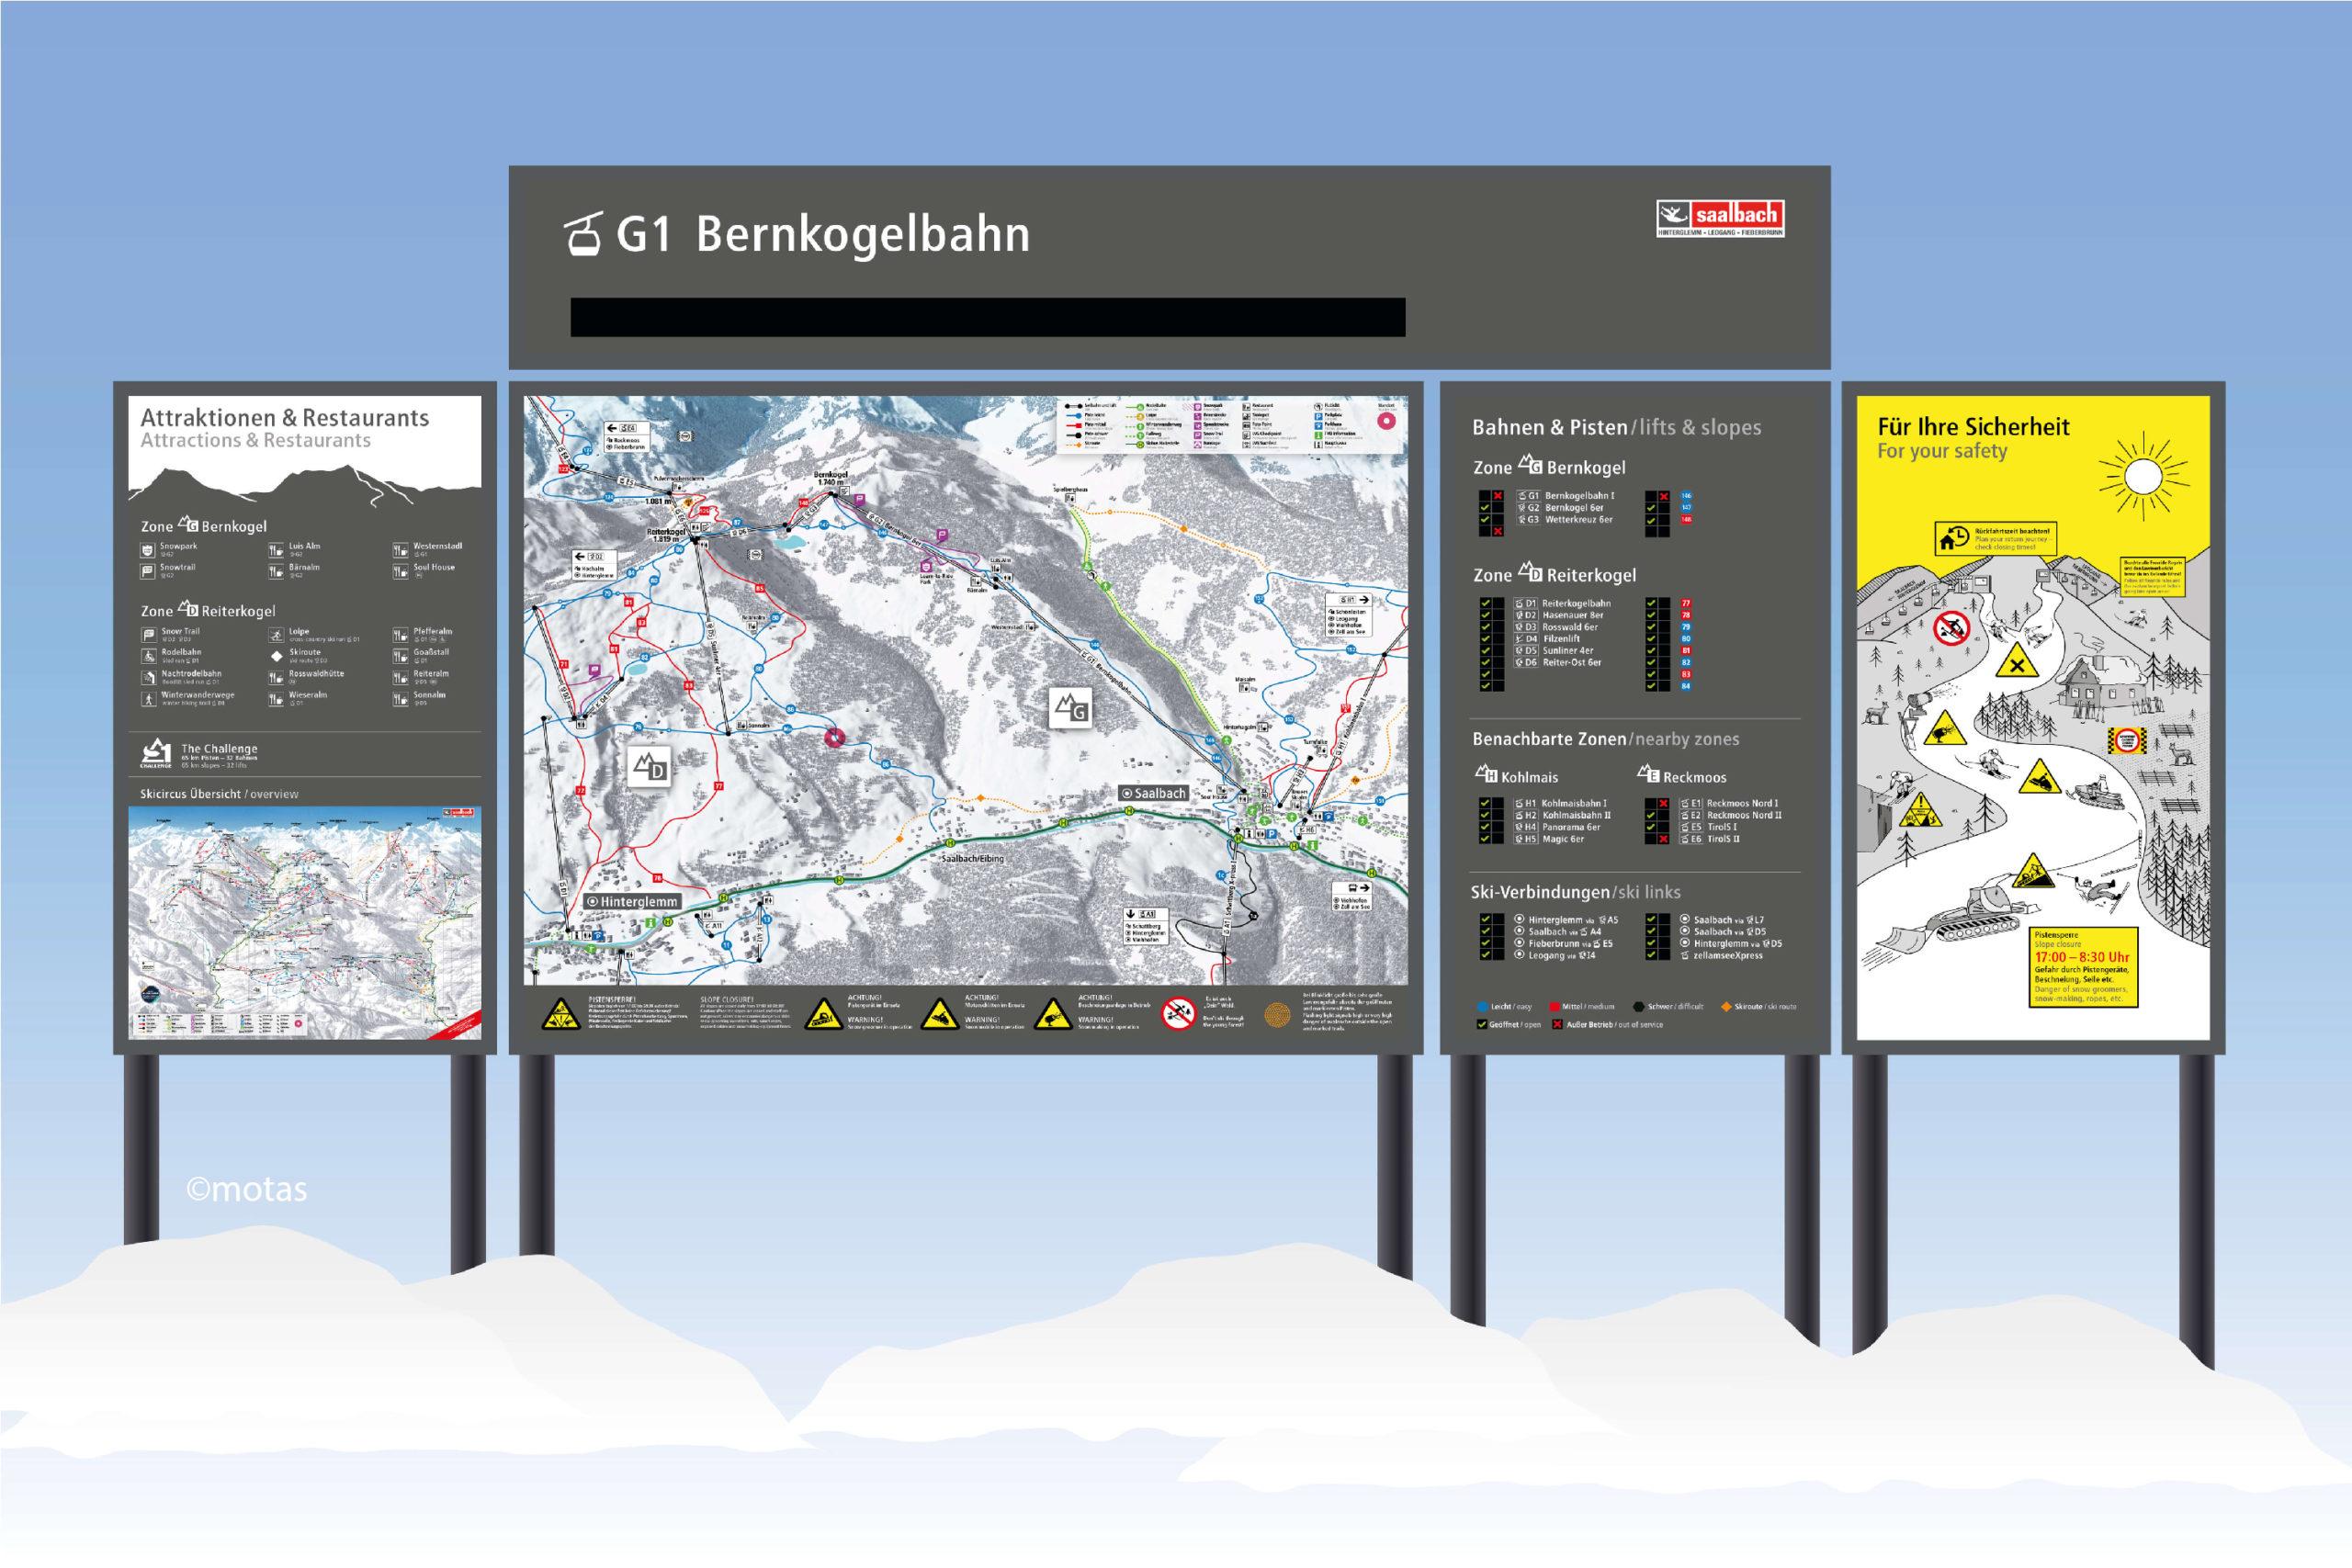 Pistenleitsystem Skicircus Saalbach Hinterglemm Leogang Fieberbrunn Zone G Bernkogel